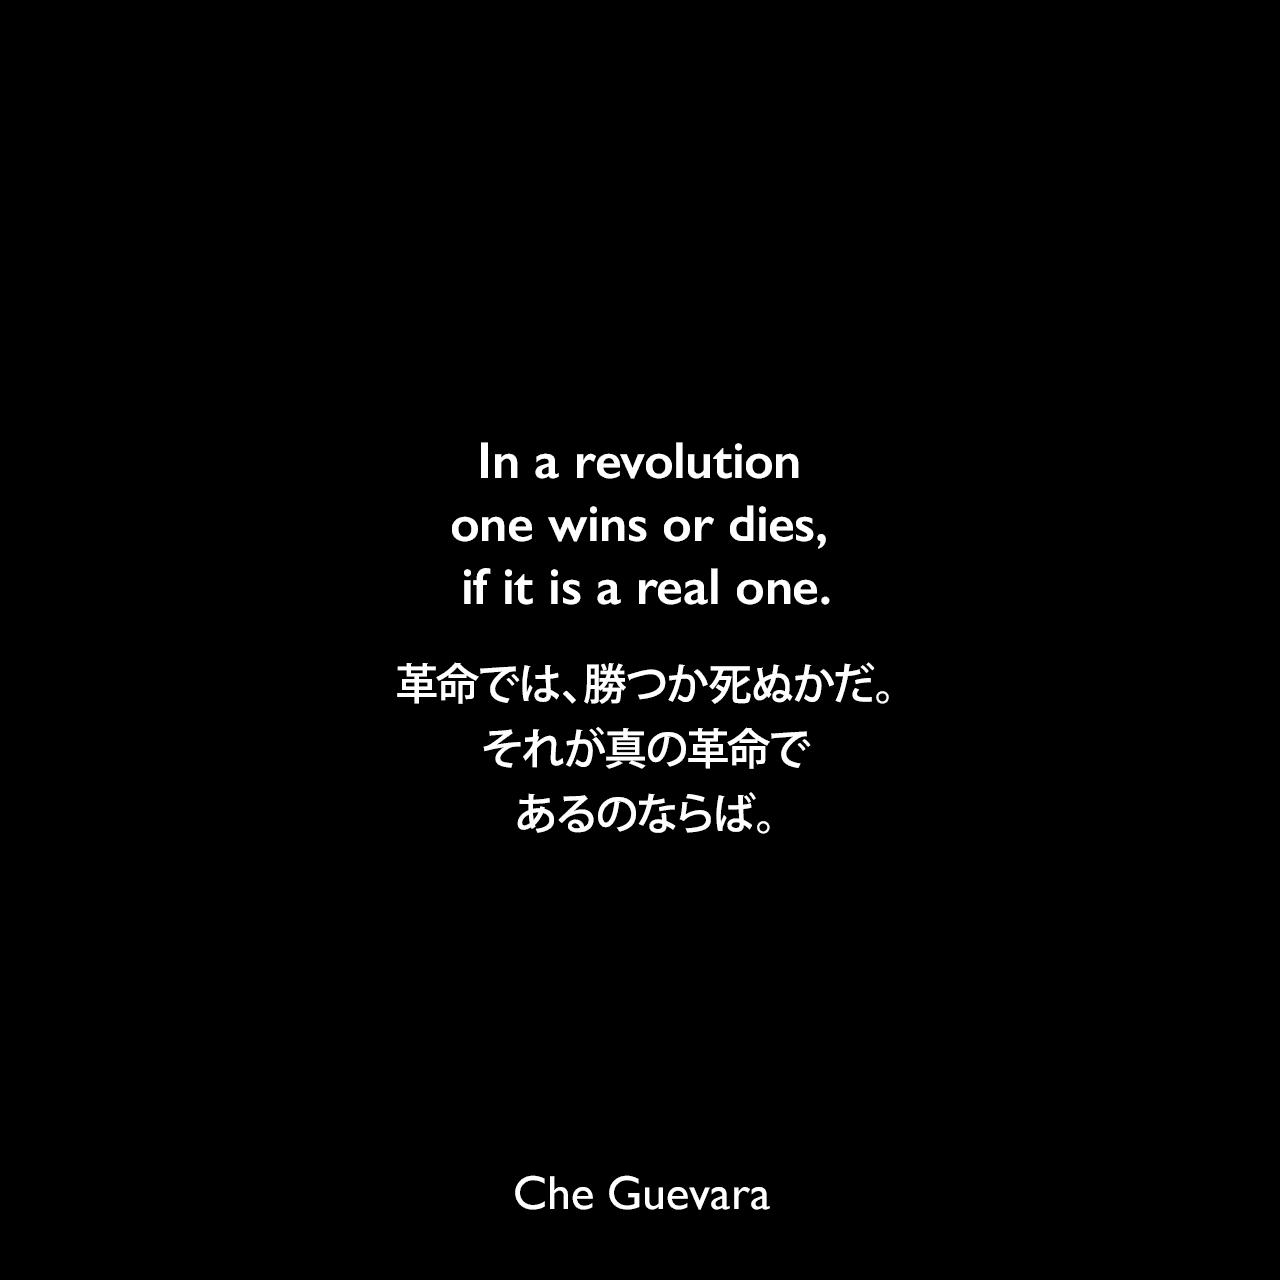 In a revolution one wins or dies, if it is a real one.革命では、勝つか死ぬかだ。それが真の革命であるのならば。- 1965年4月1日「チェからフィデル・カストロへの別れの手紙」よりChe Guevara